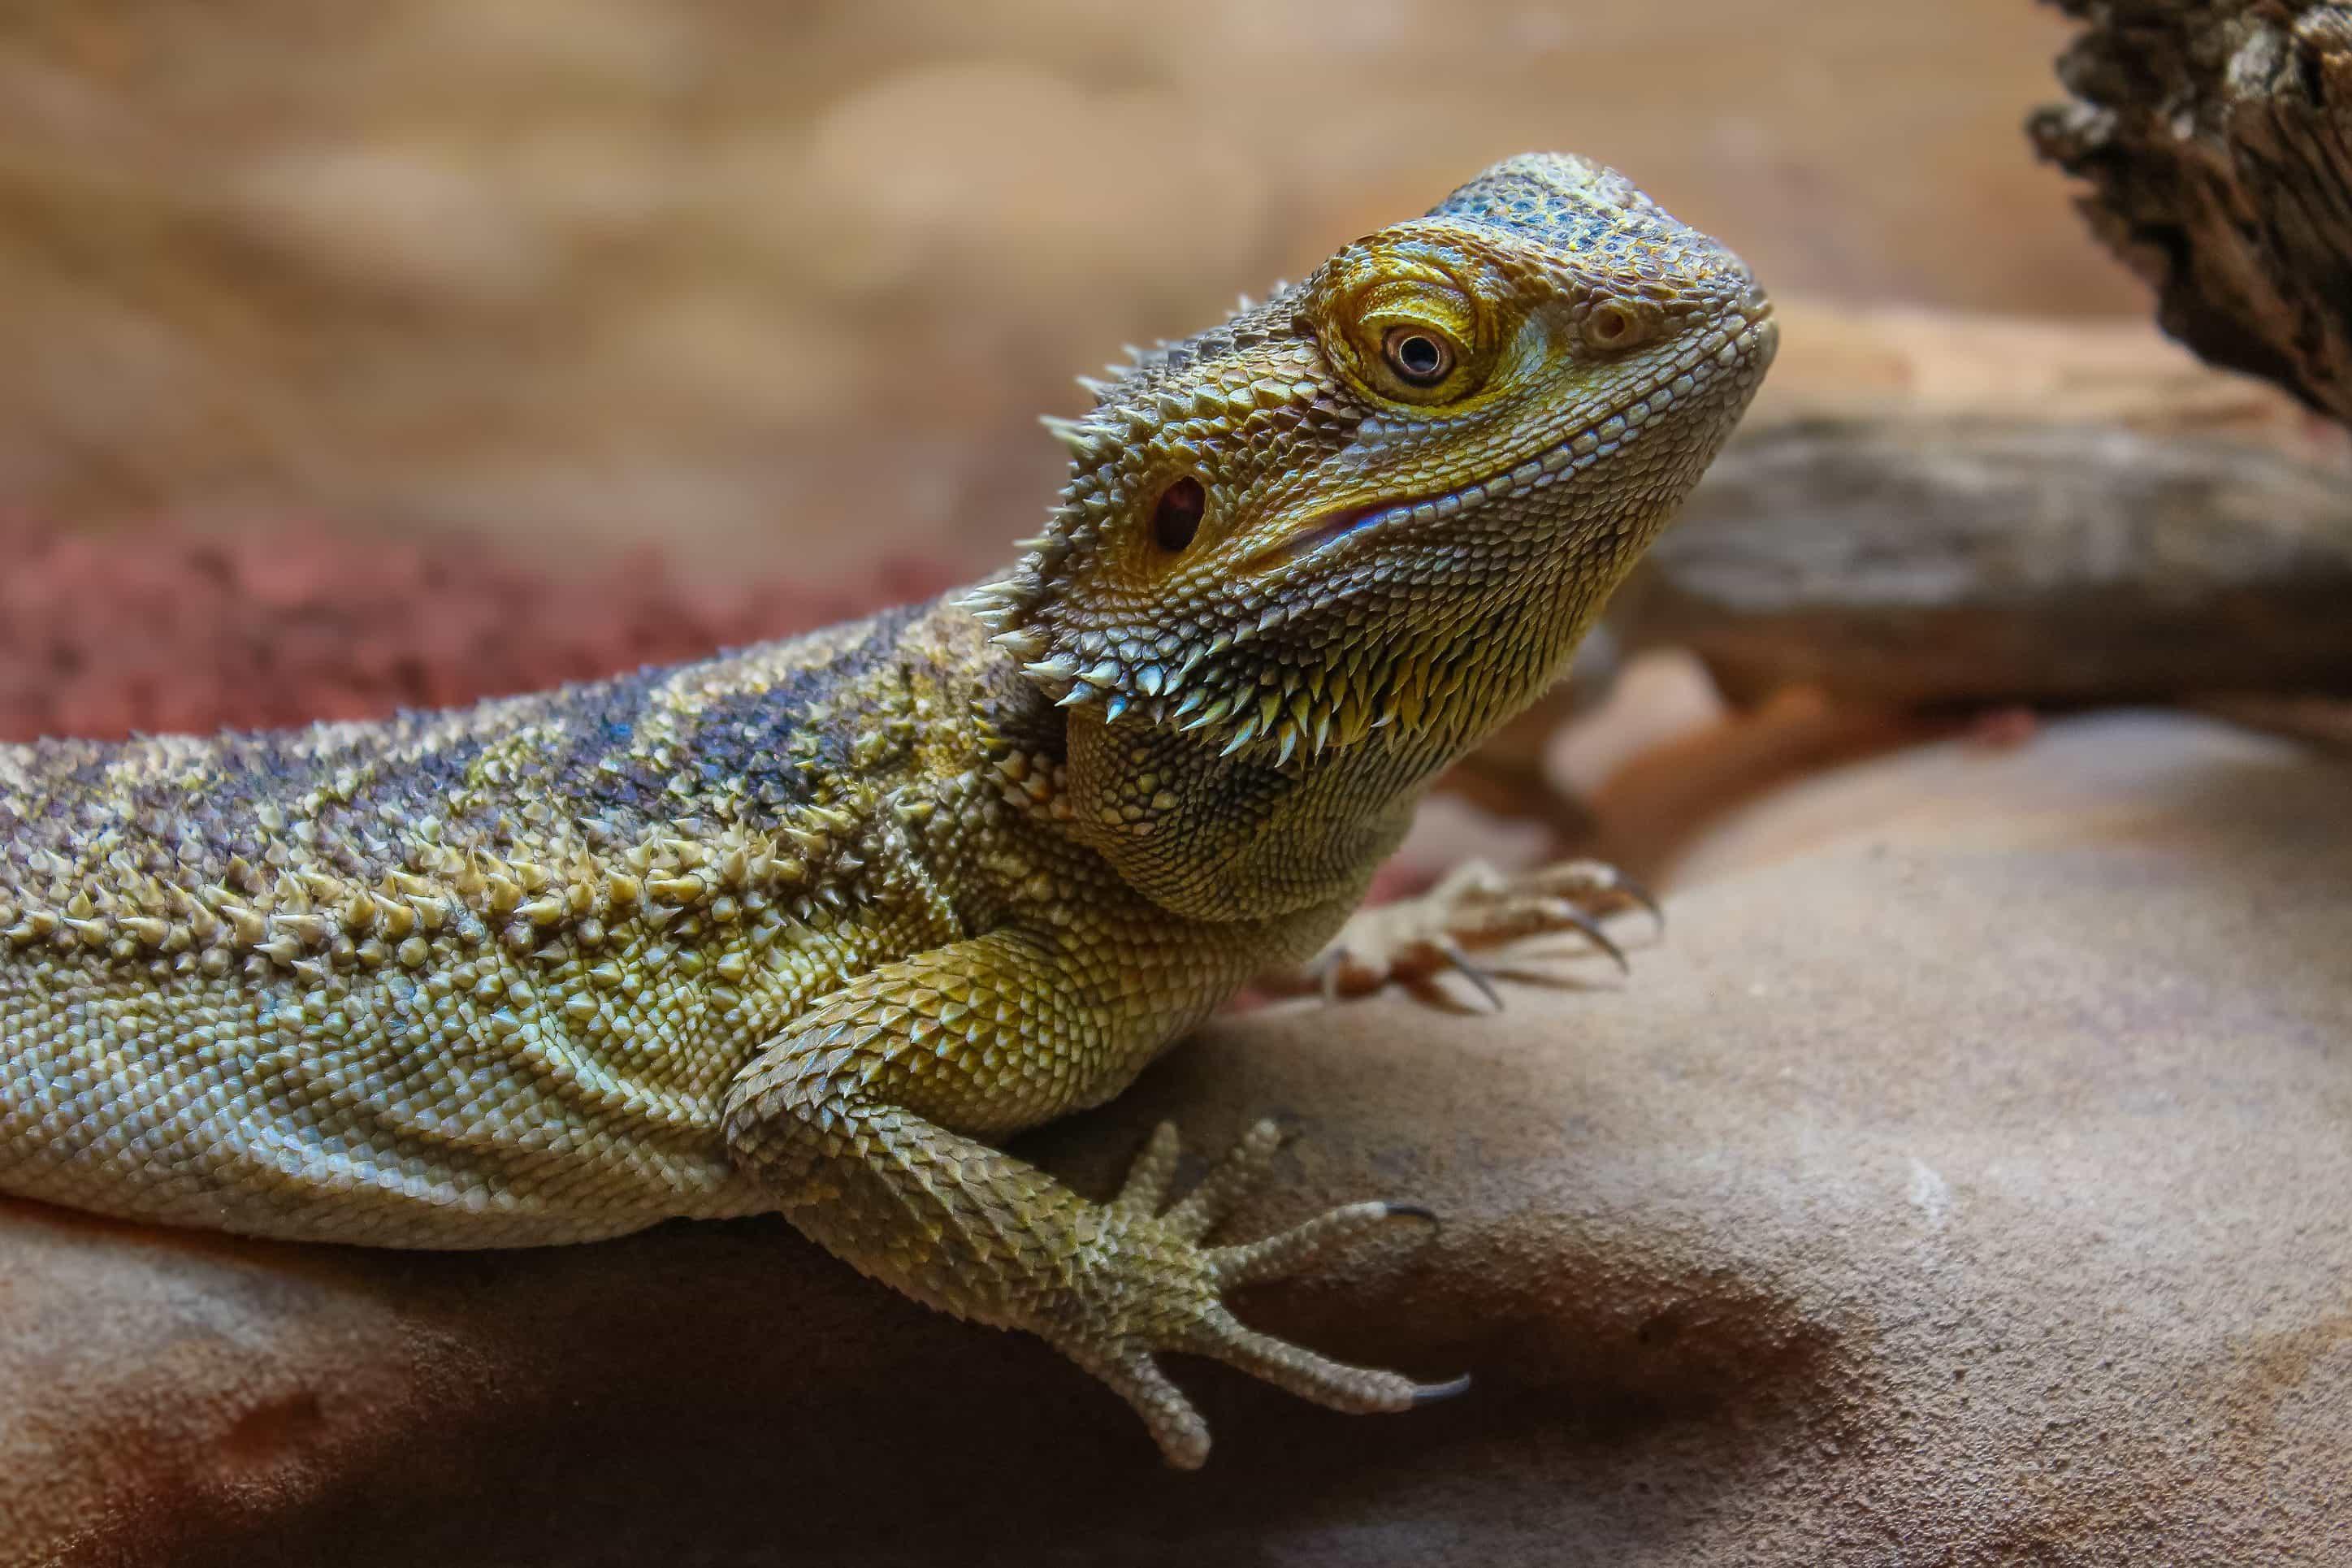 Free picture: lizard, reptile, nature, wildlife ...